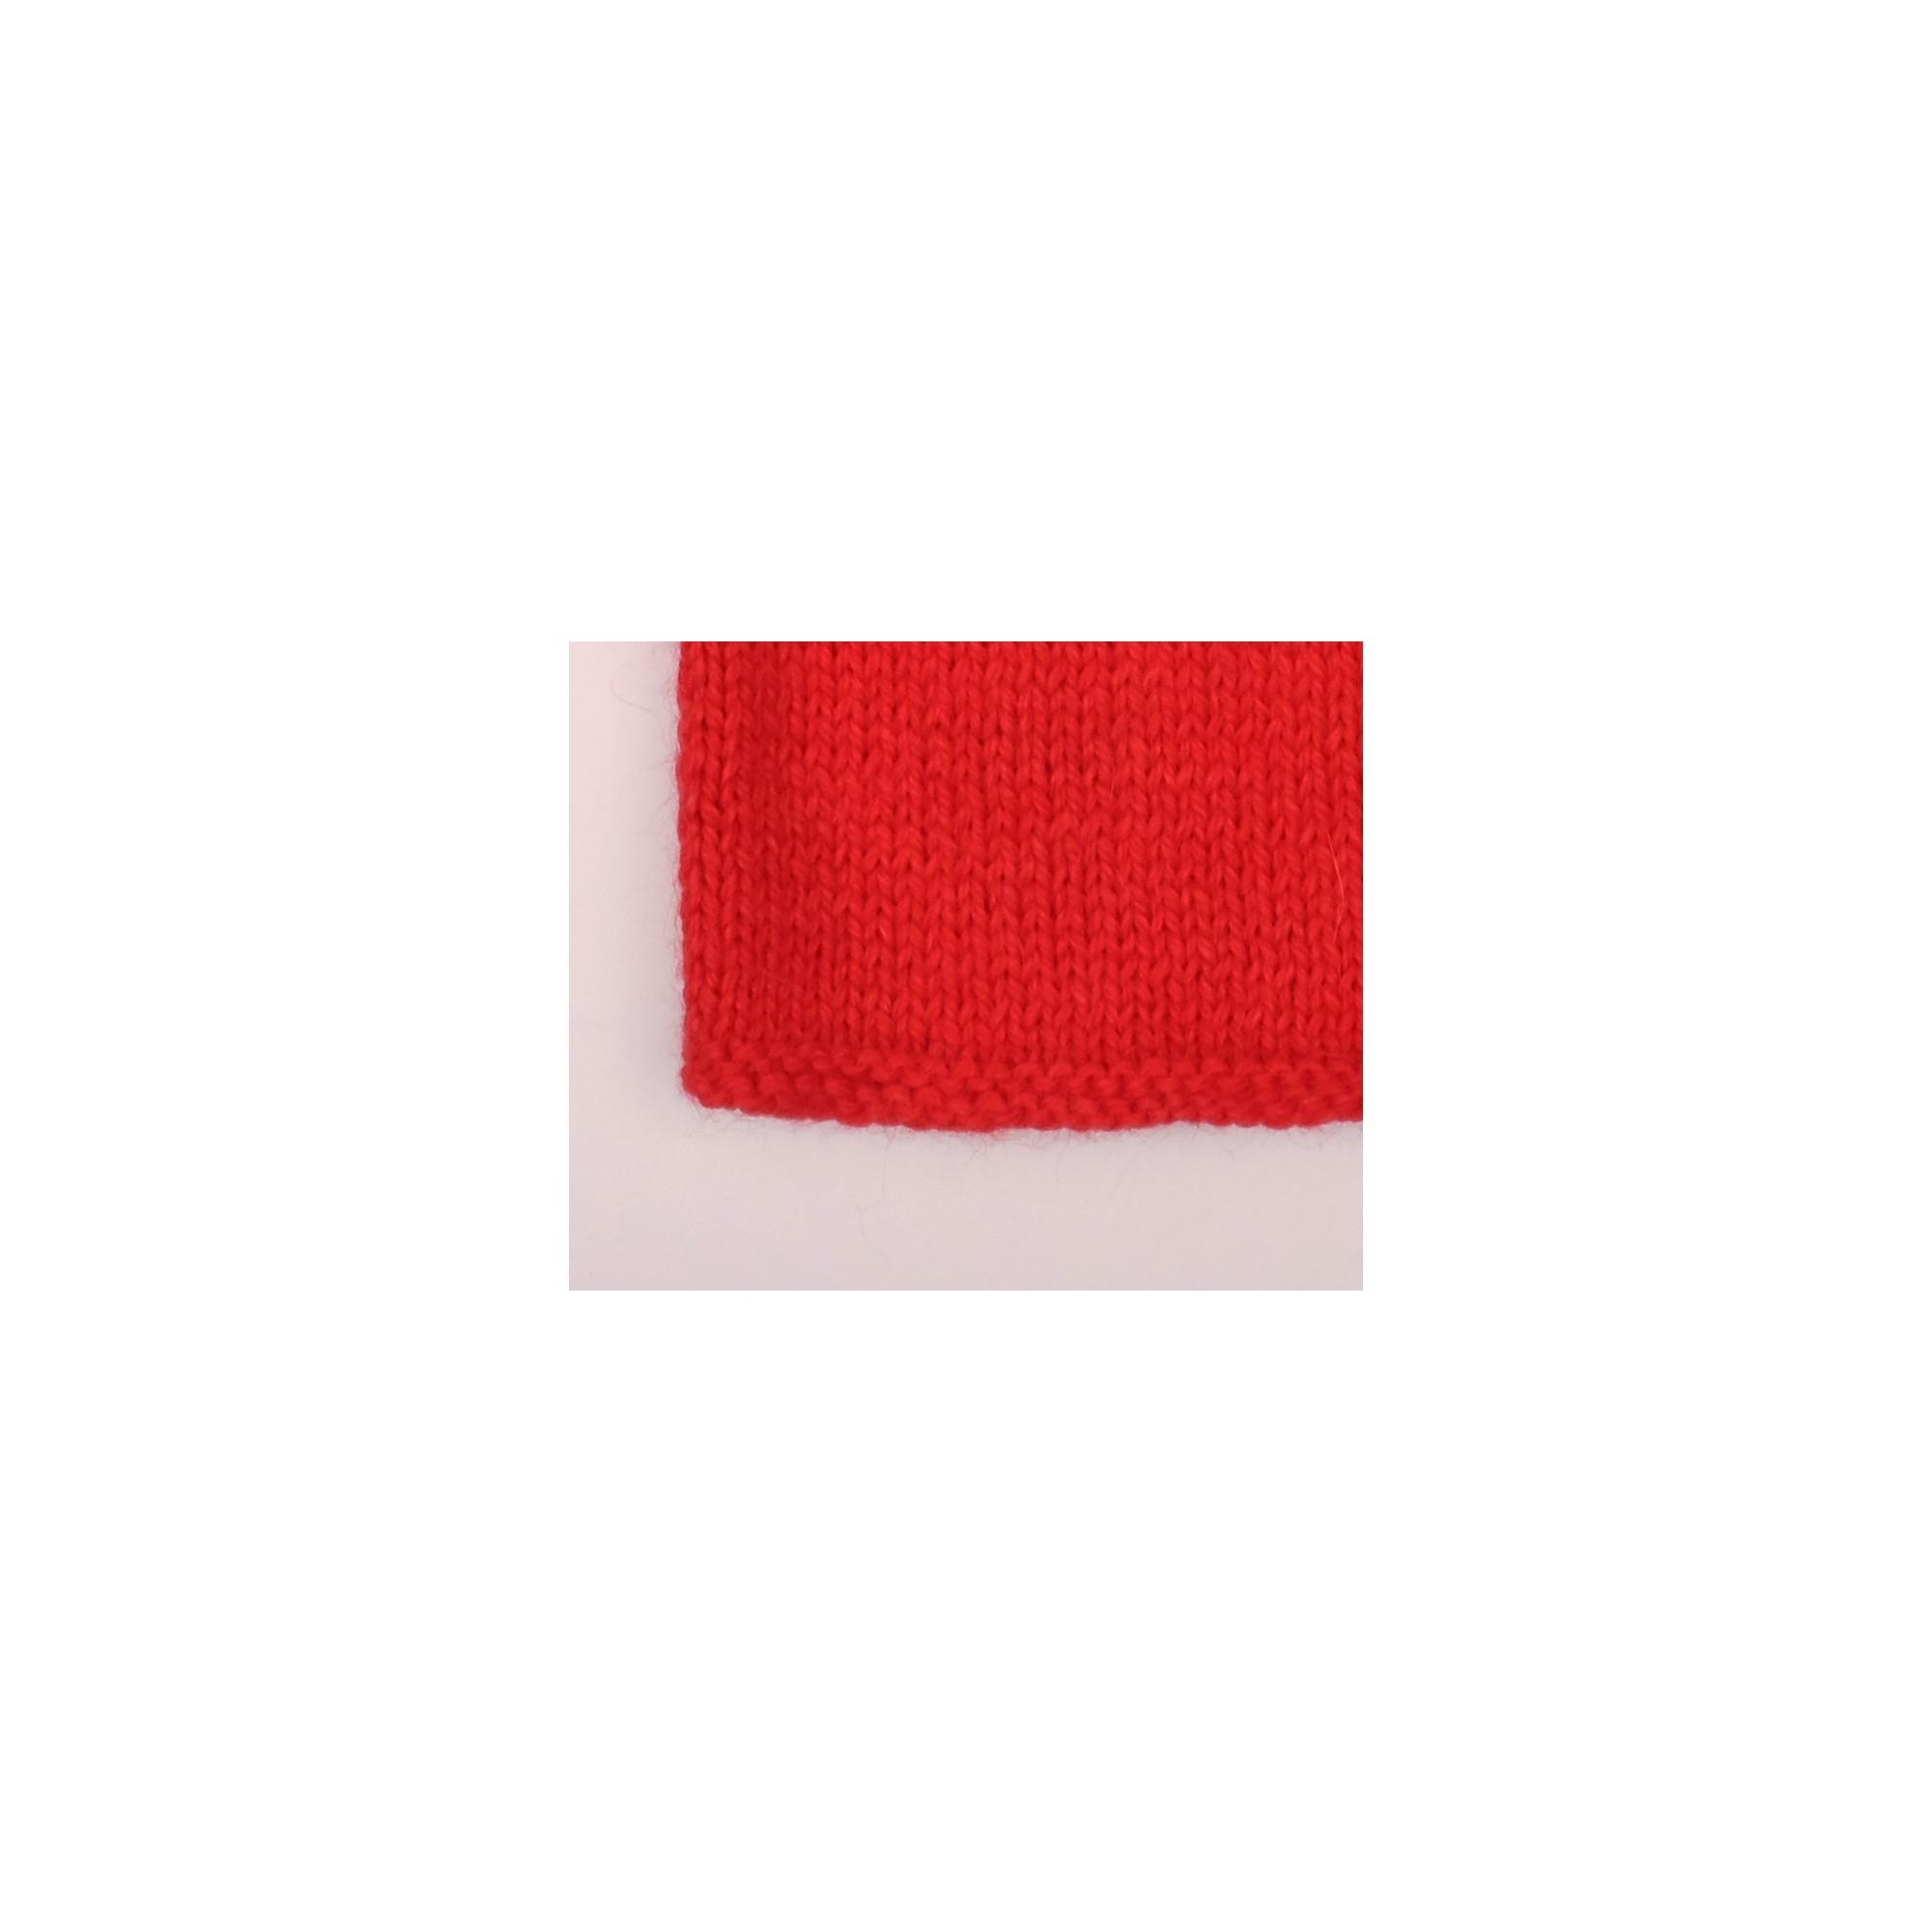 Pull Agénor laine alpaga rouge coeur blanc bébé détail 4